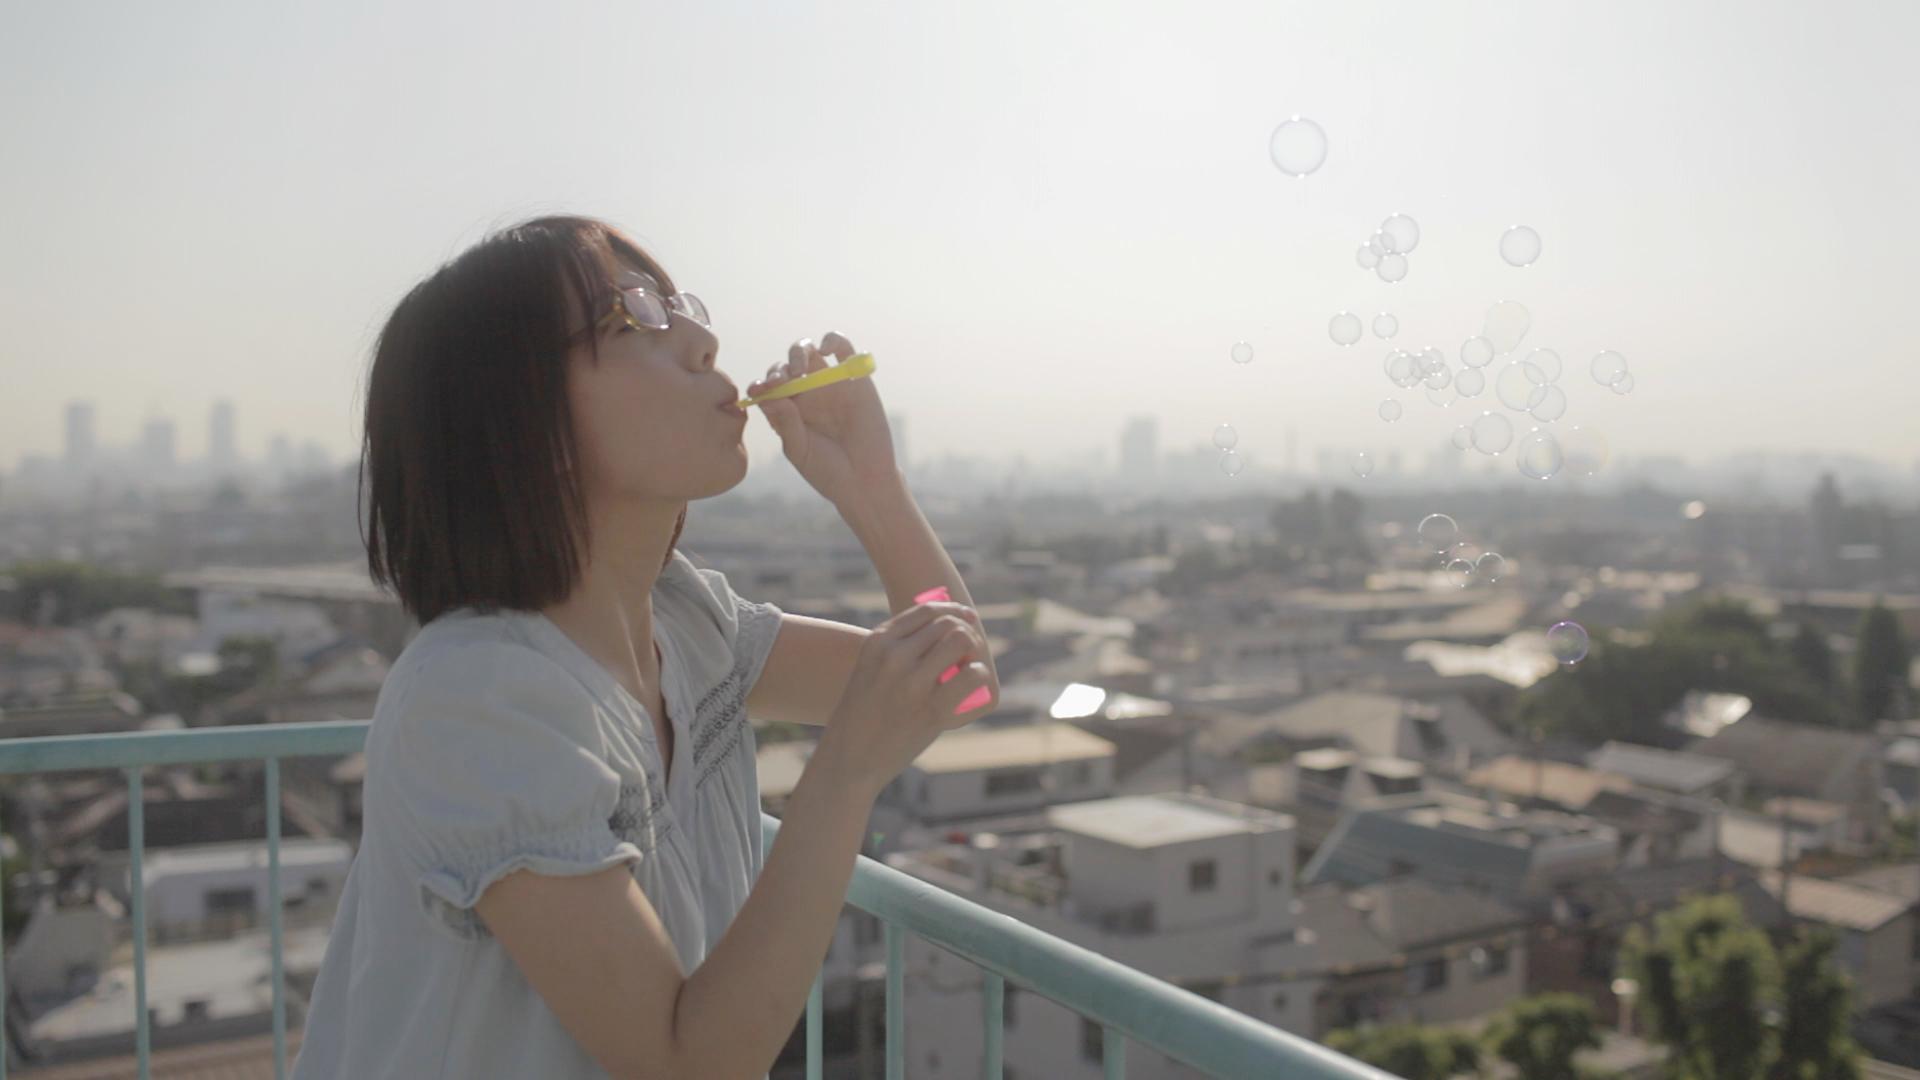 【MV】Bubble(2012/6min)